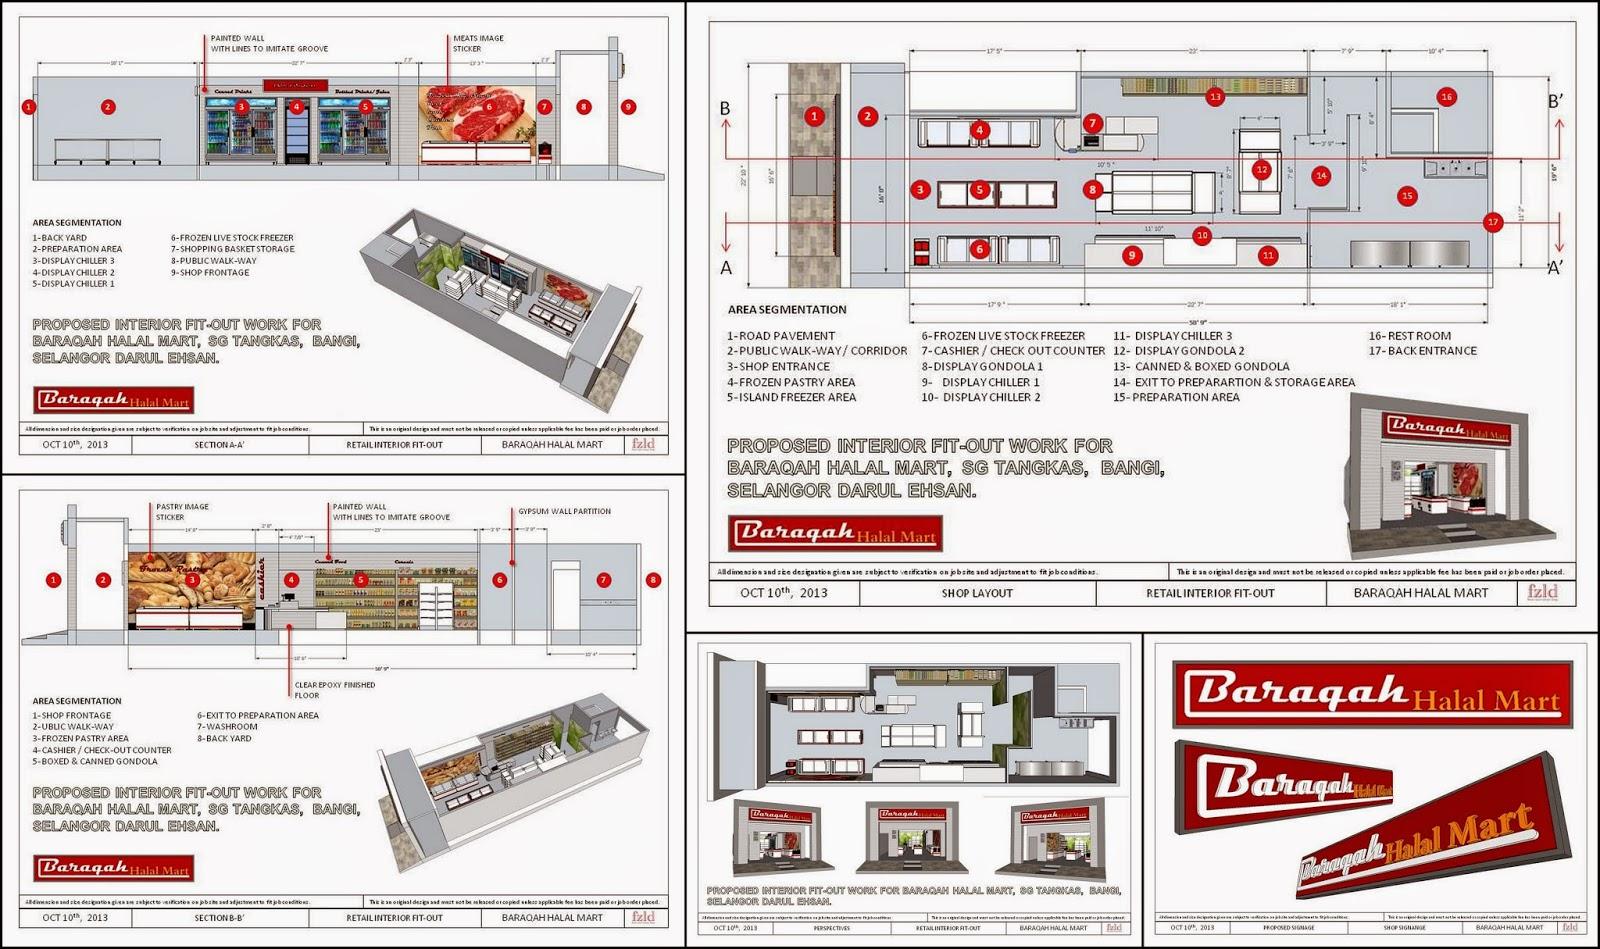 fzld - Faizah Zainal Lifestyle Design: Baraqah Halal Mart